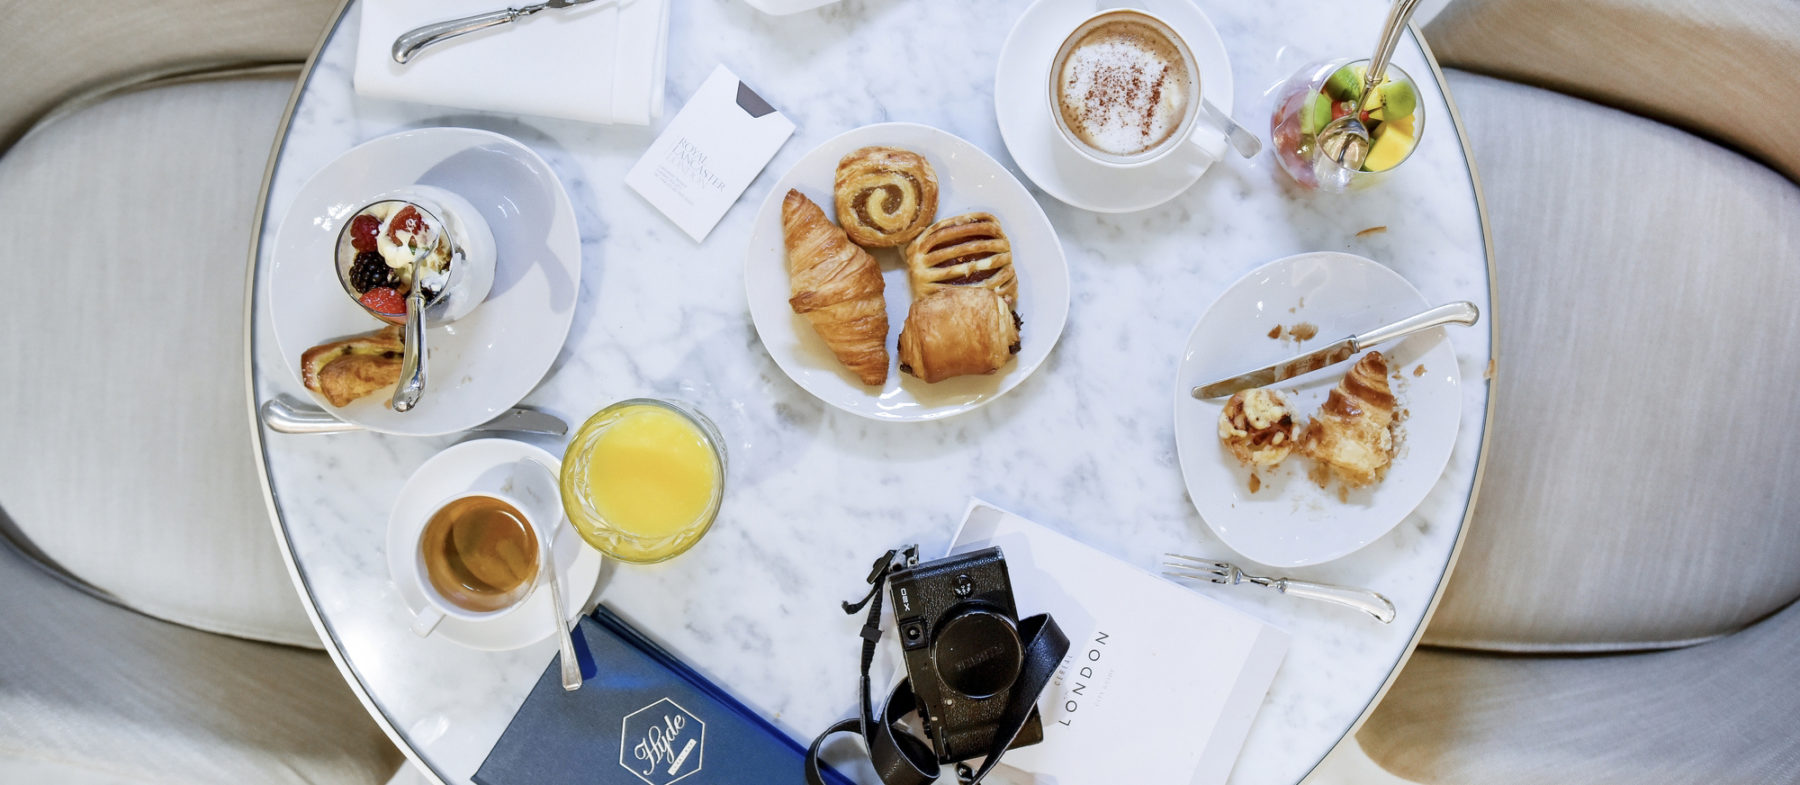 Best Breakfast near Hyde Park and Lancaster Gate